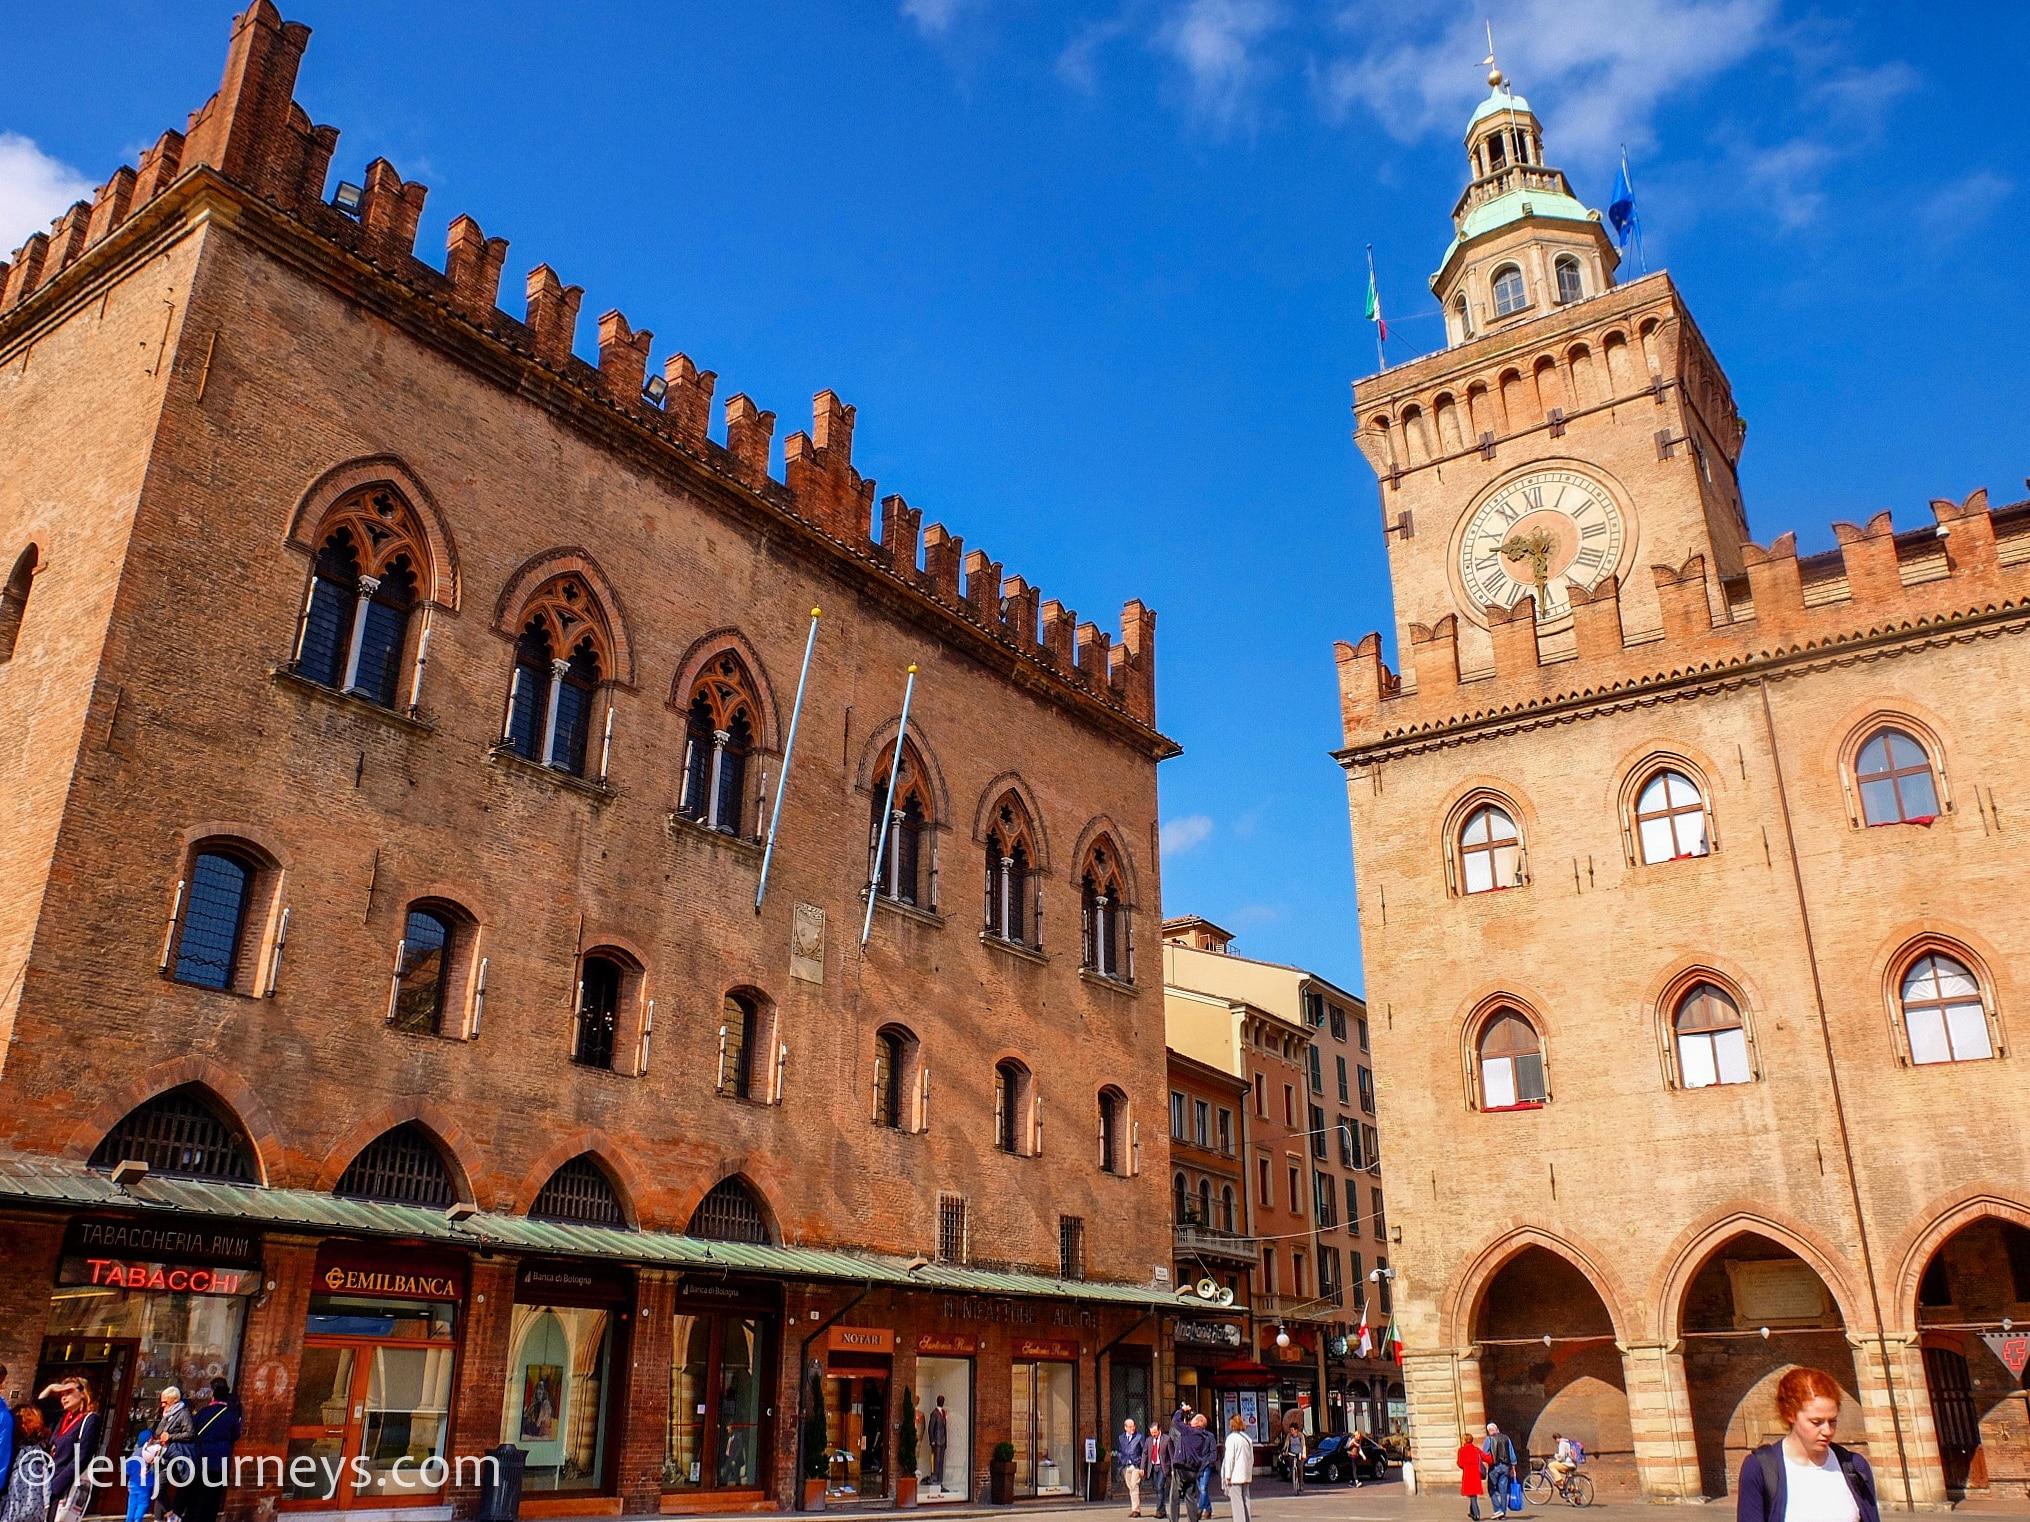 University of Bologna – Europe's oldest university